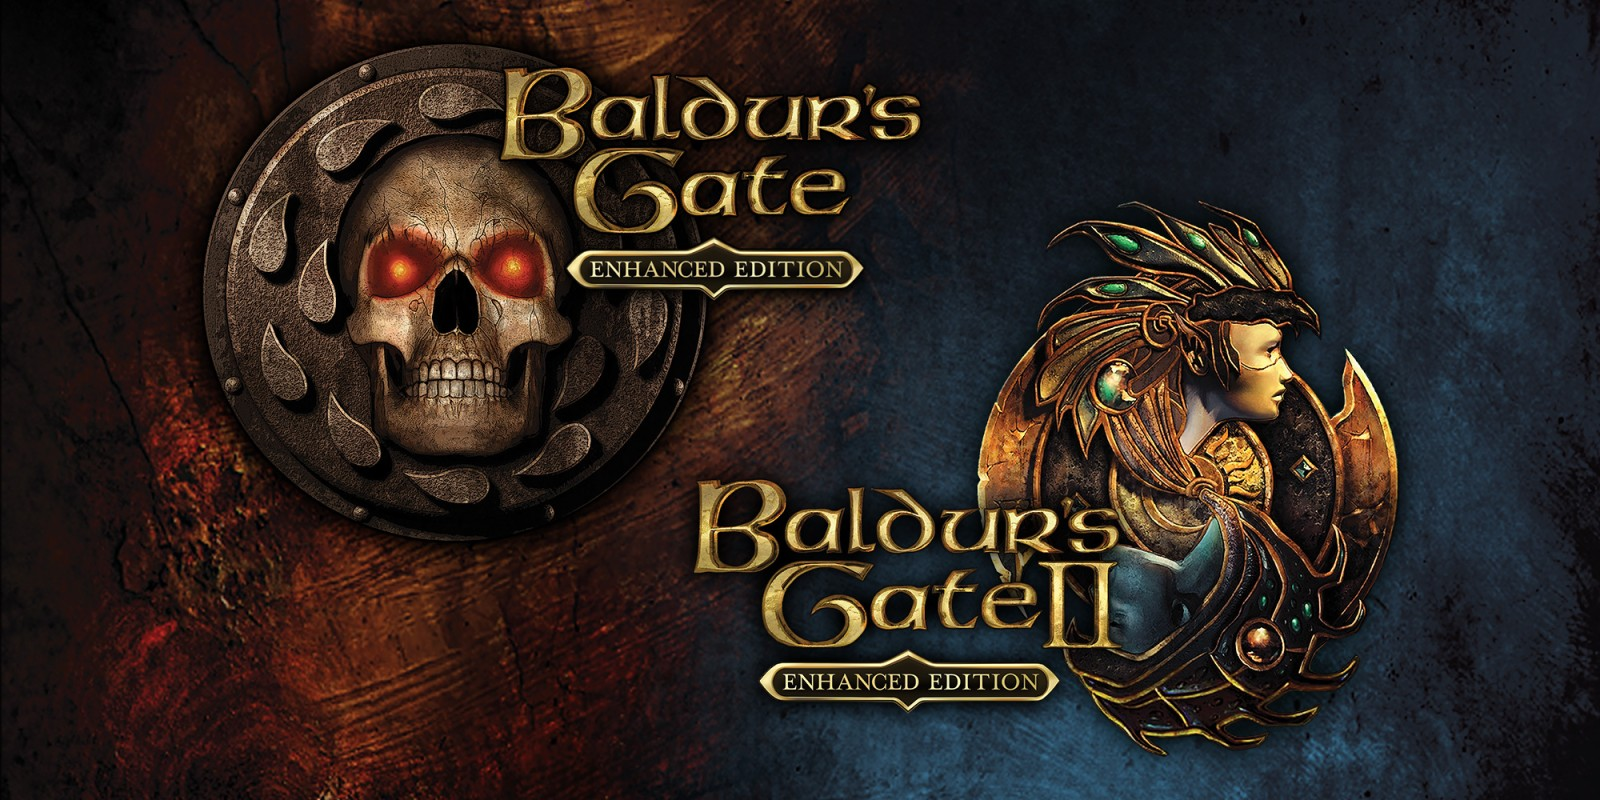 Baldur's Gate Enhanced Edition Delayed.